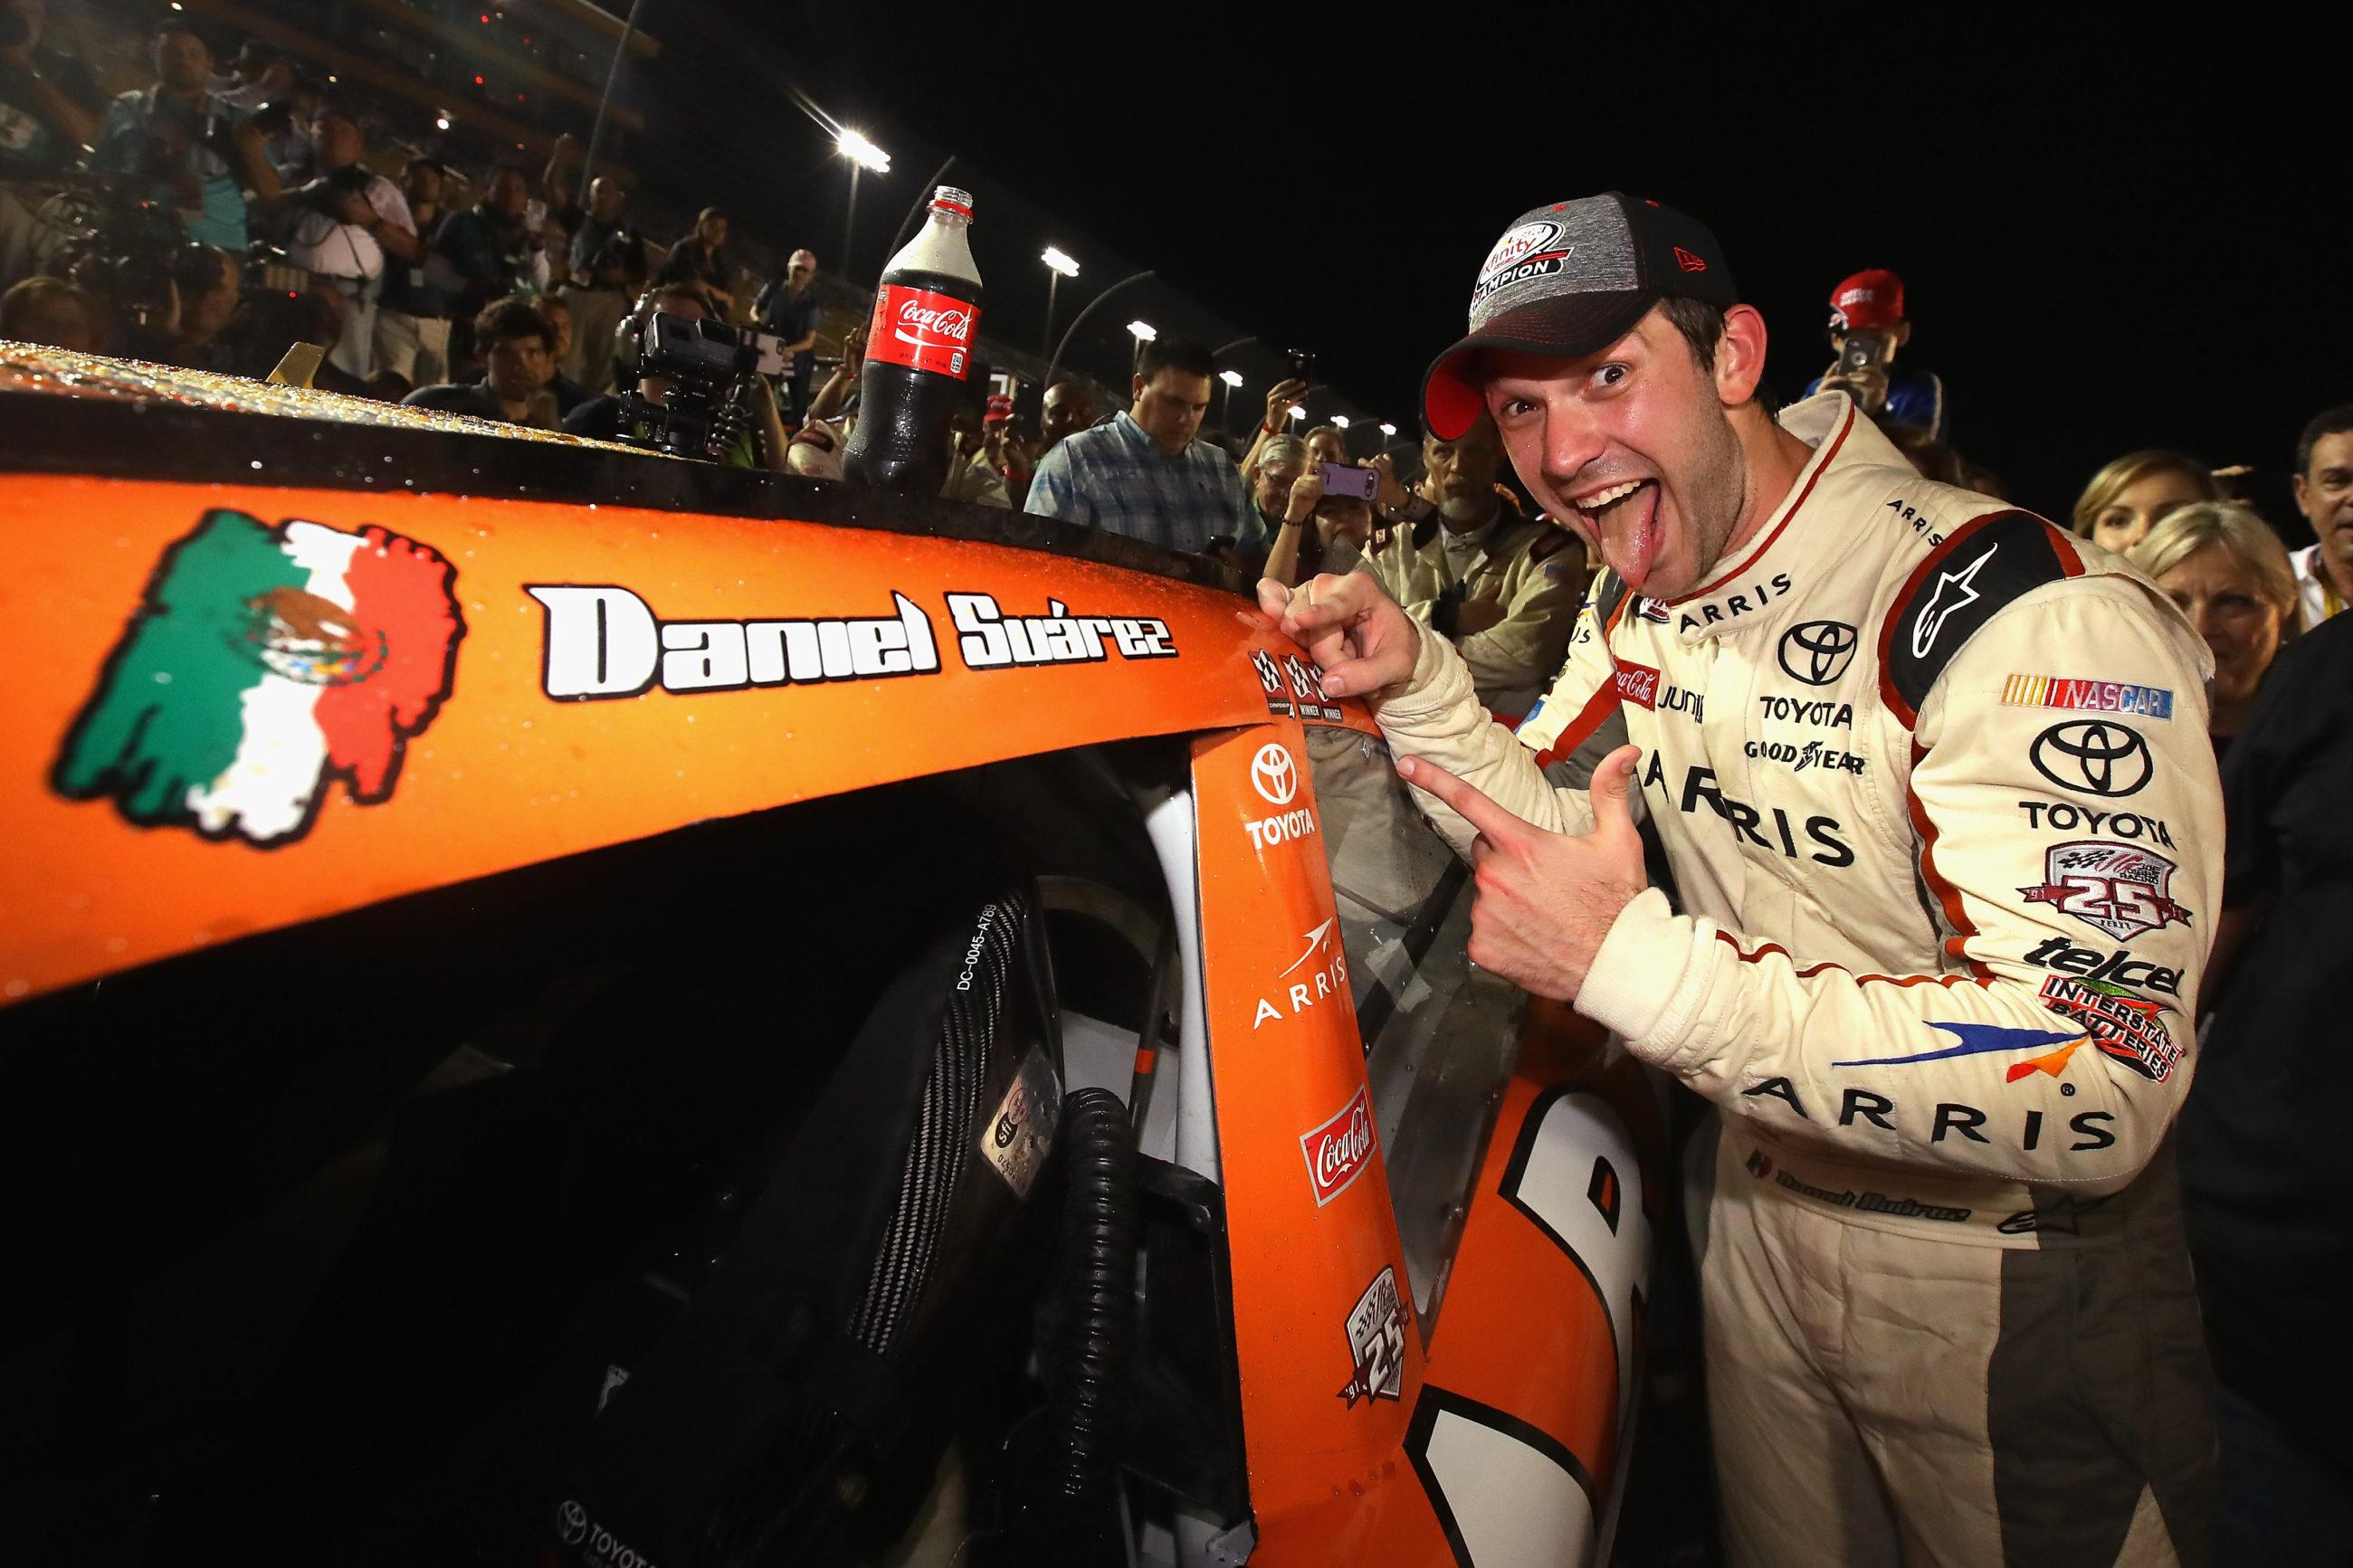 Final 2016 NASCAR XFINITY Series Championship Points - 2016 NASCAR Xfinity Champion Daniel Suarez